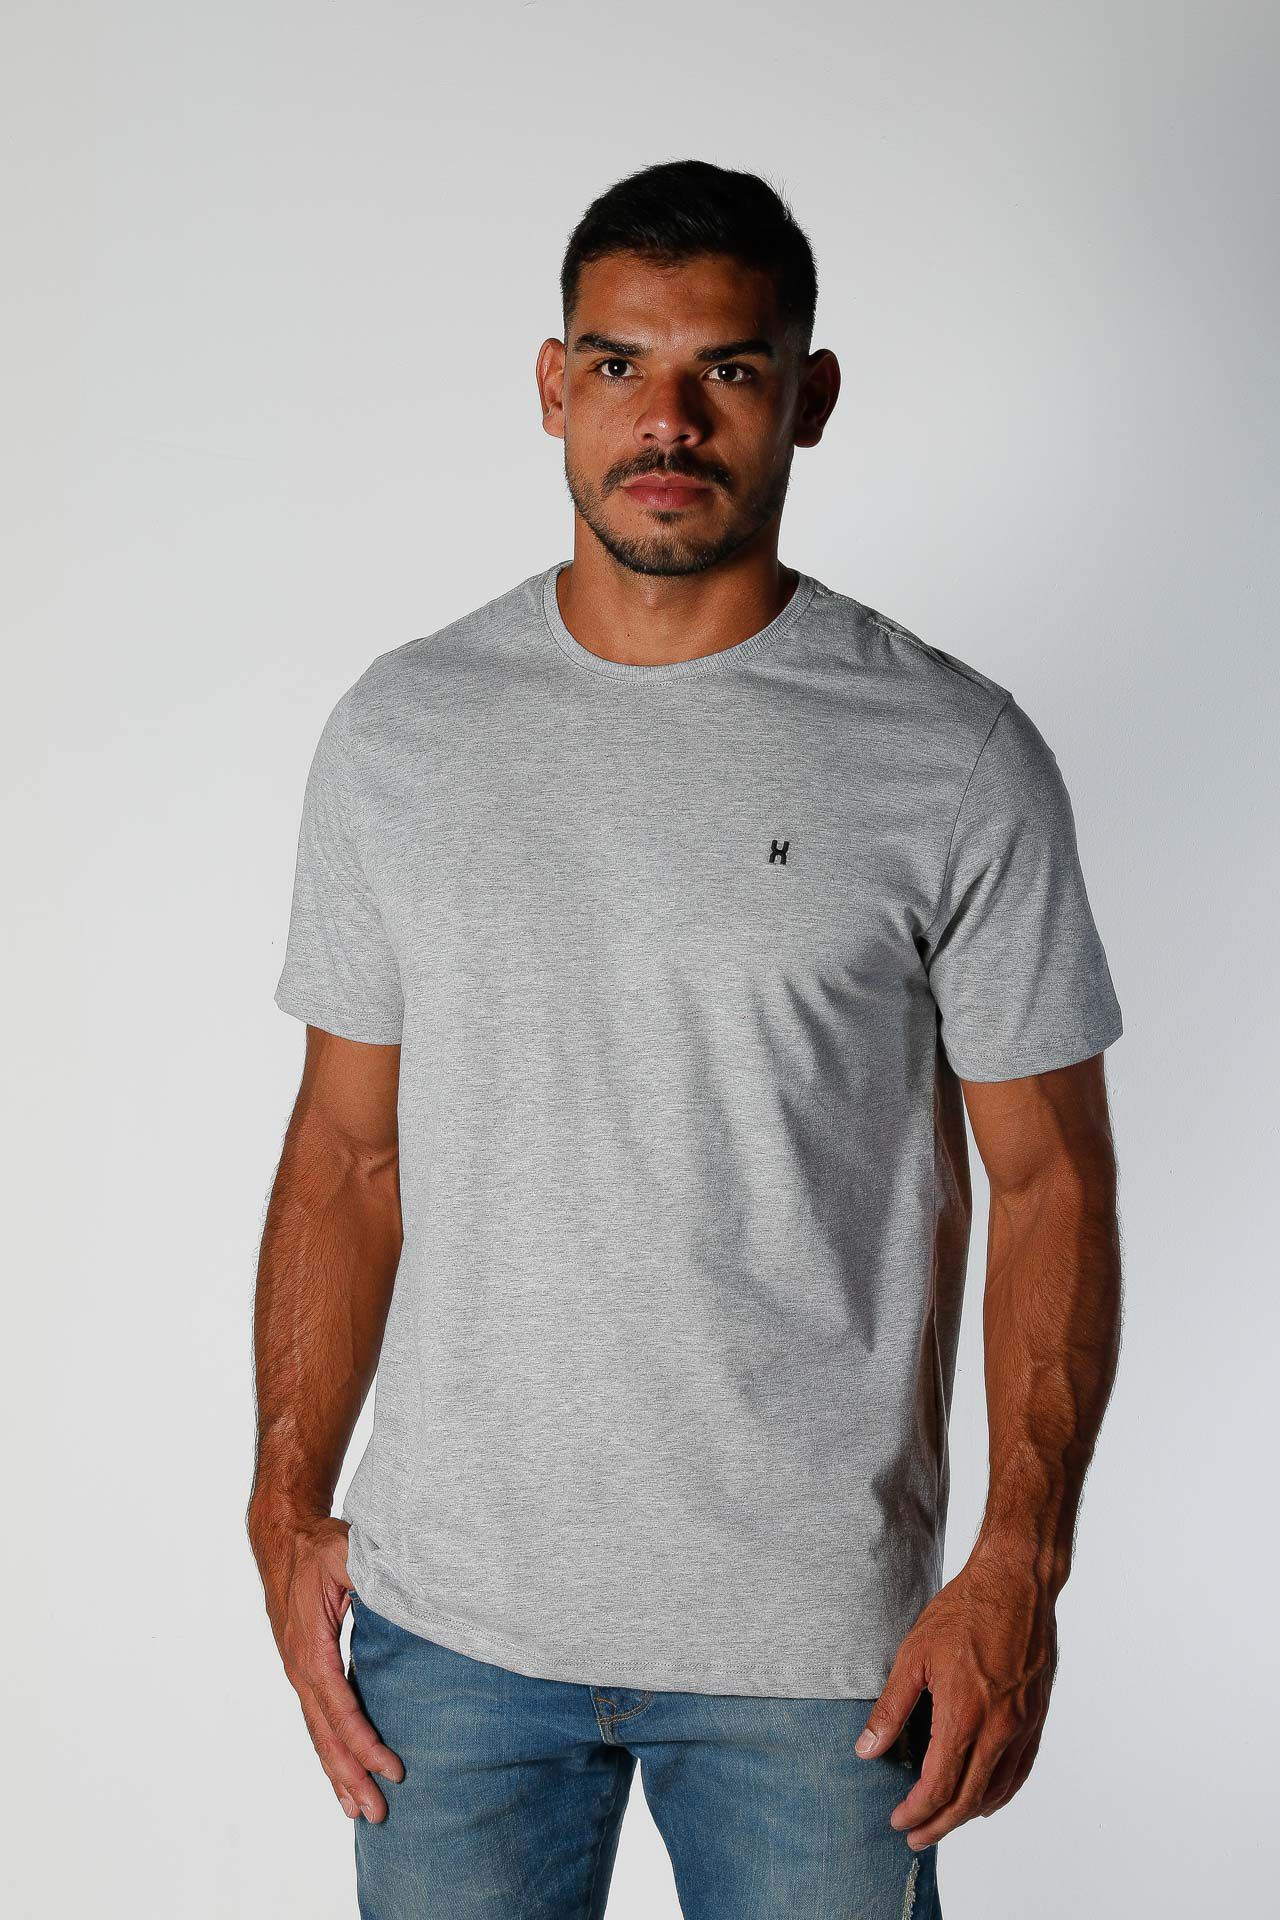 Camiseta Masculina TXC 1804